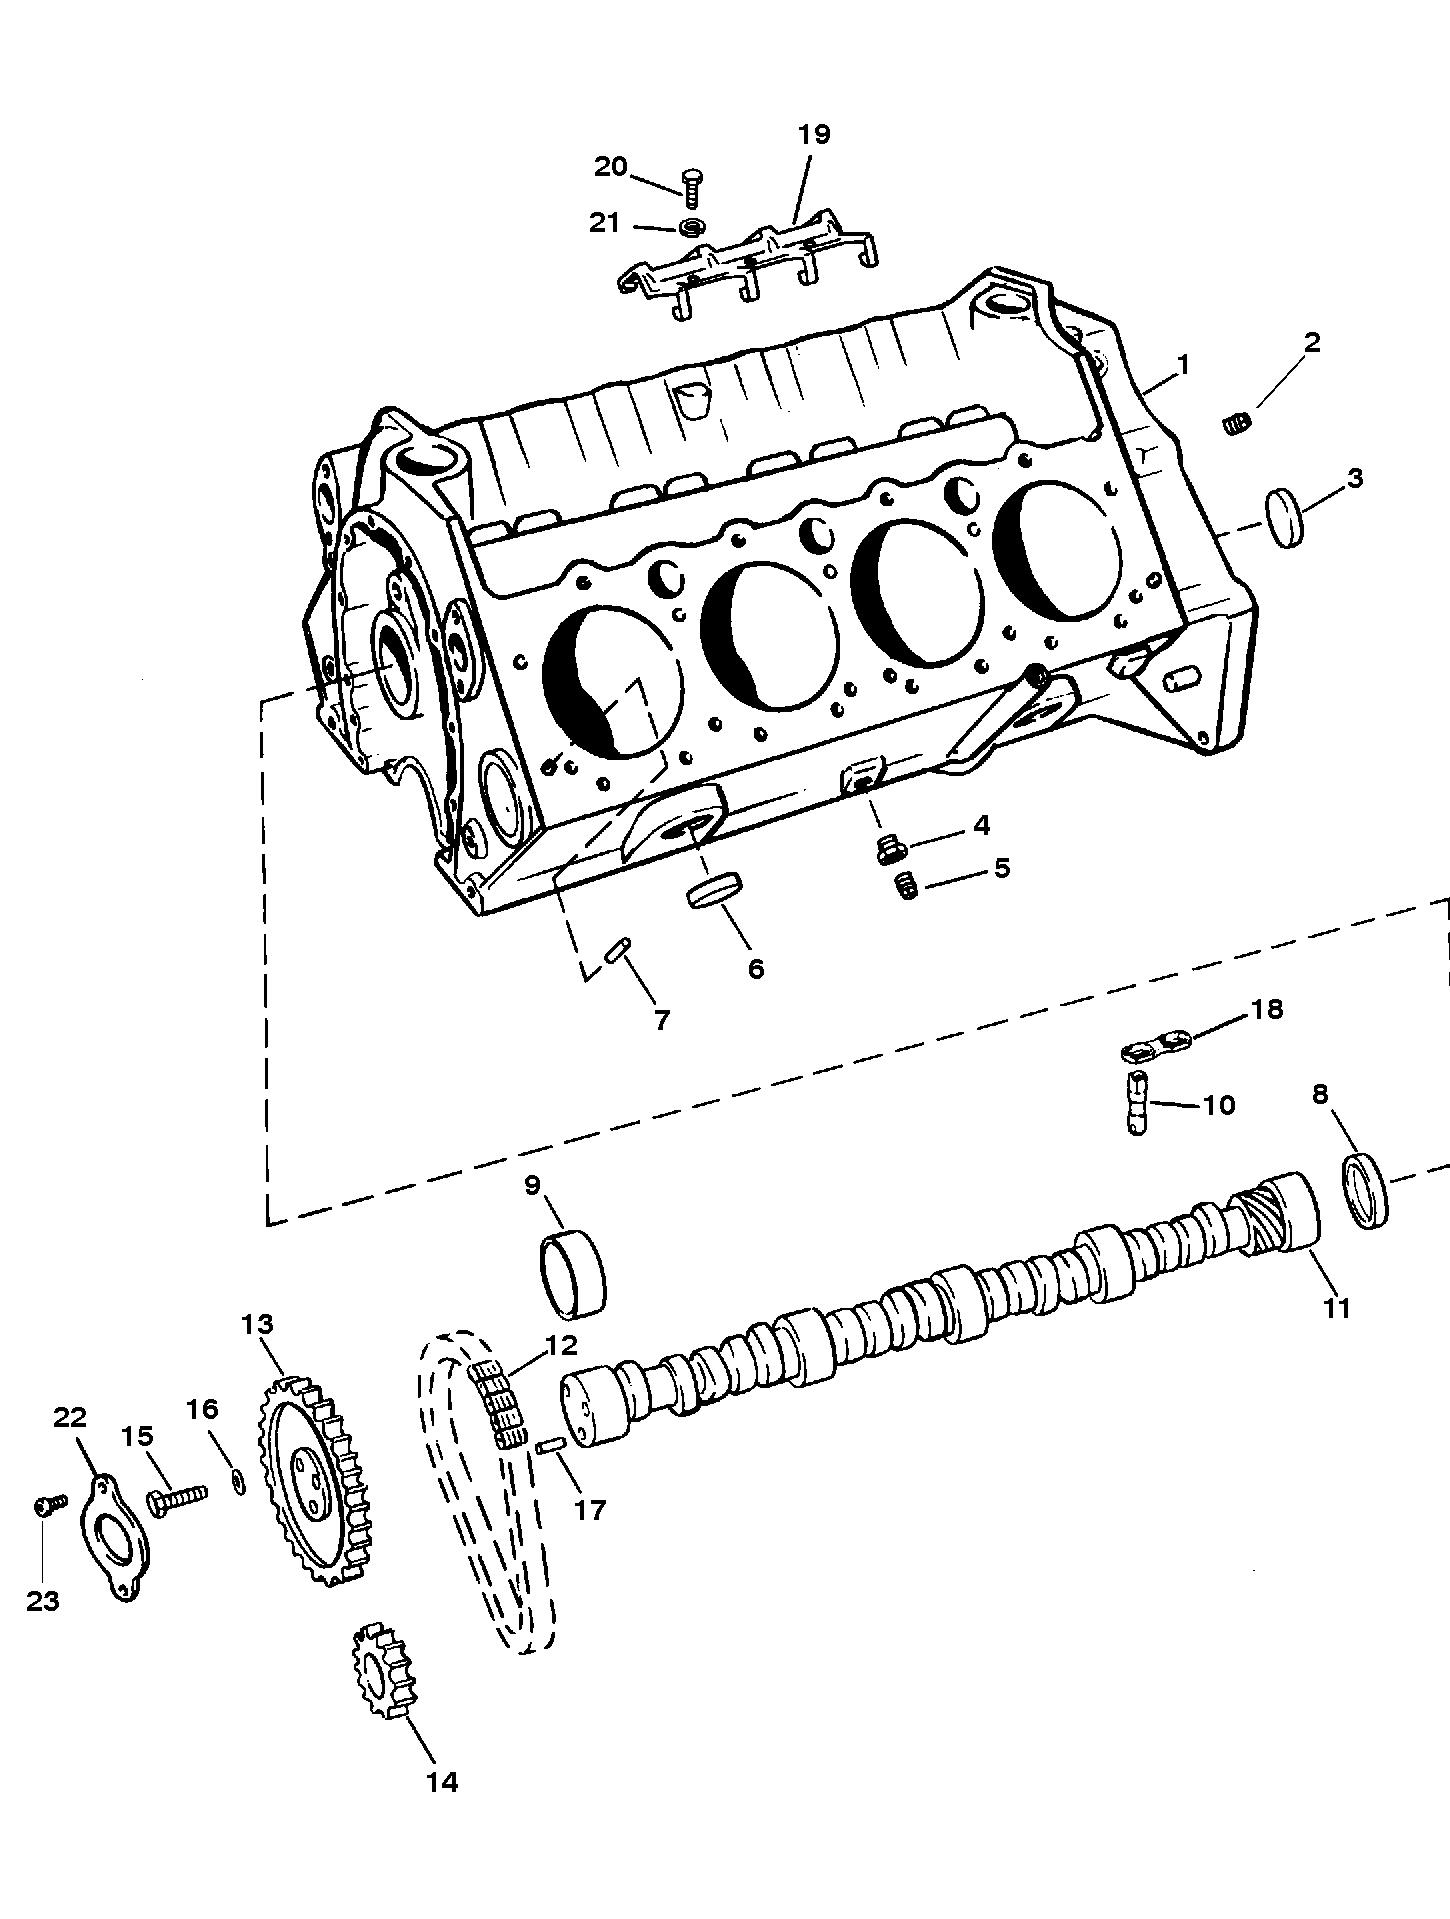 E Fuse Box Diagram Wiring Odicis Bmw E28 Repment. Bmw